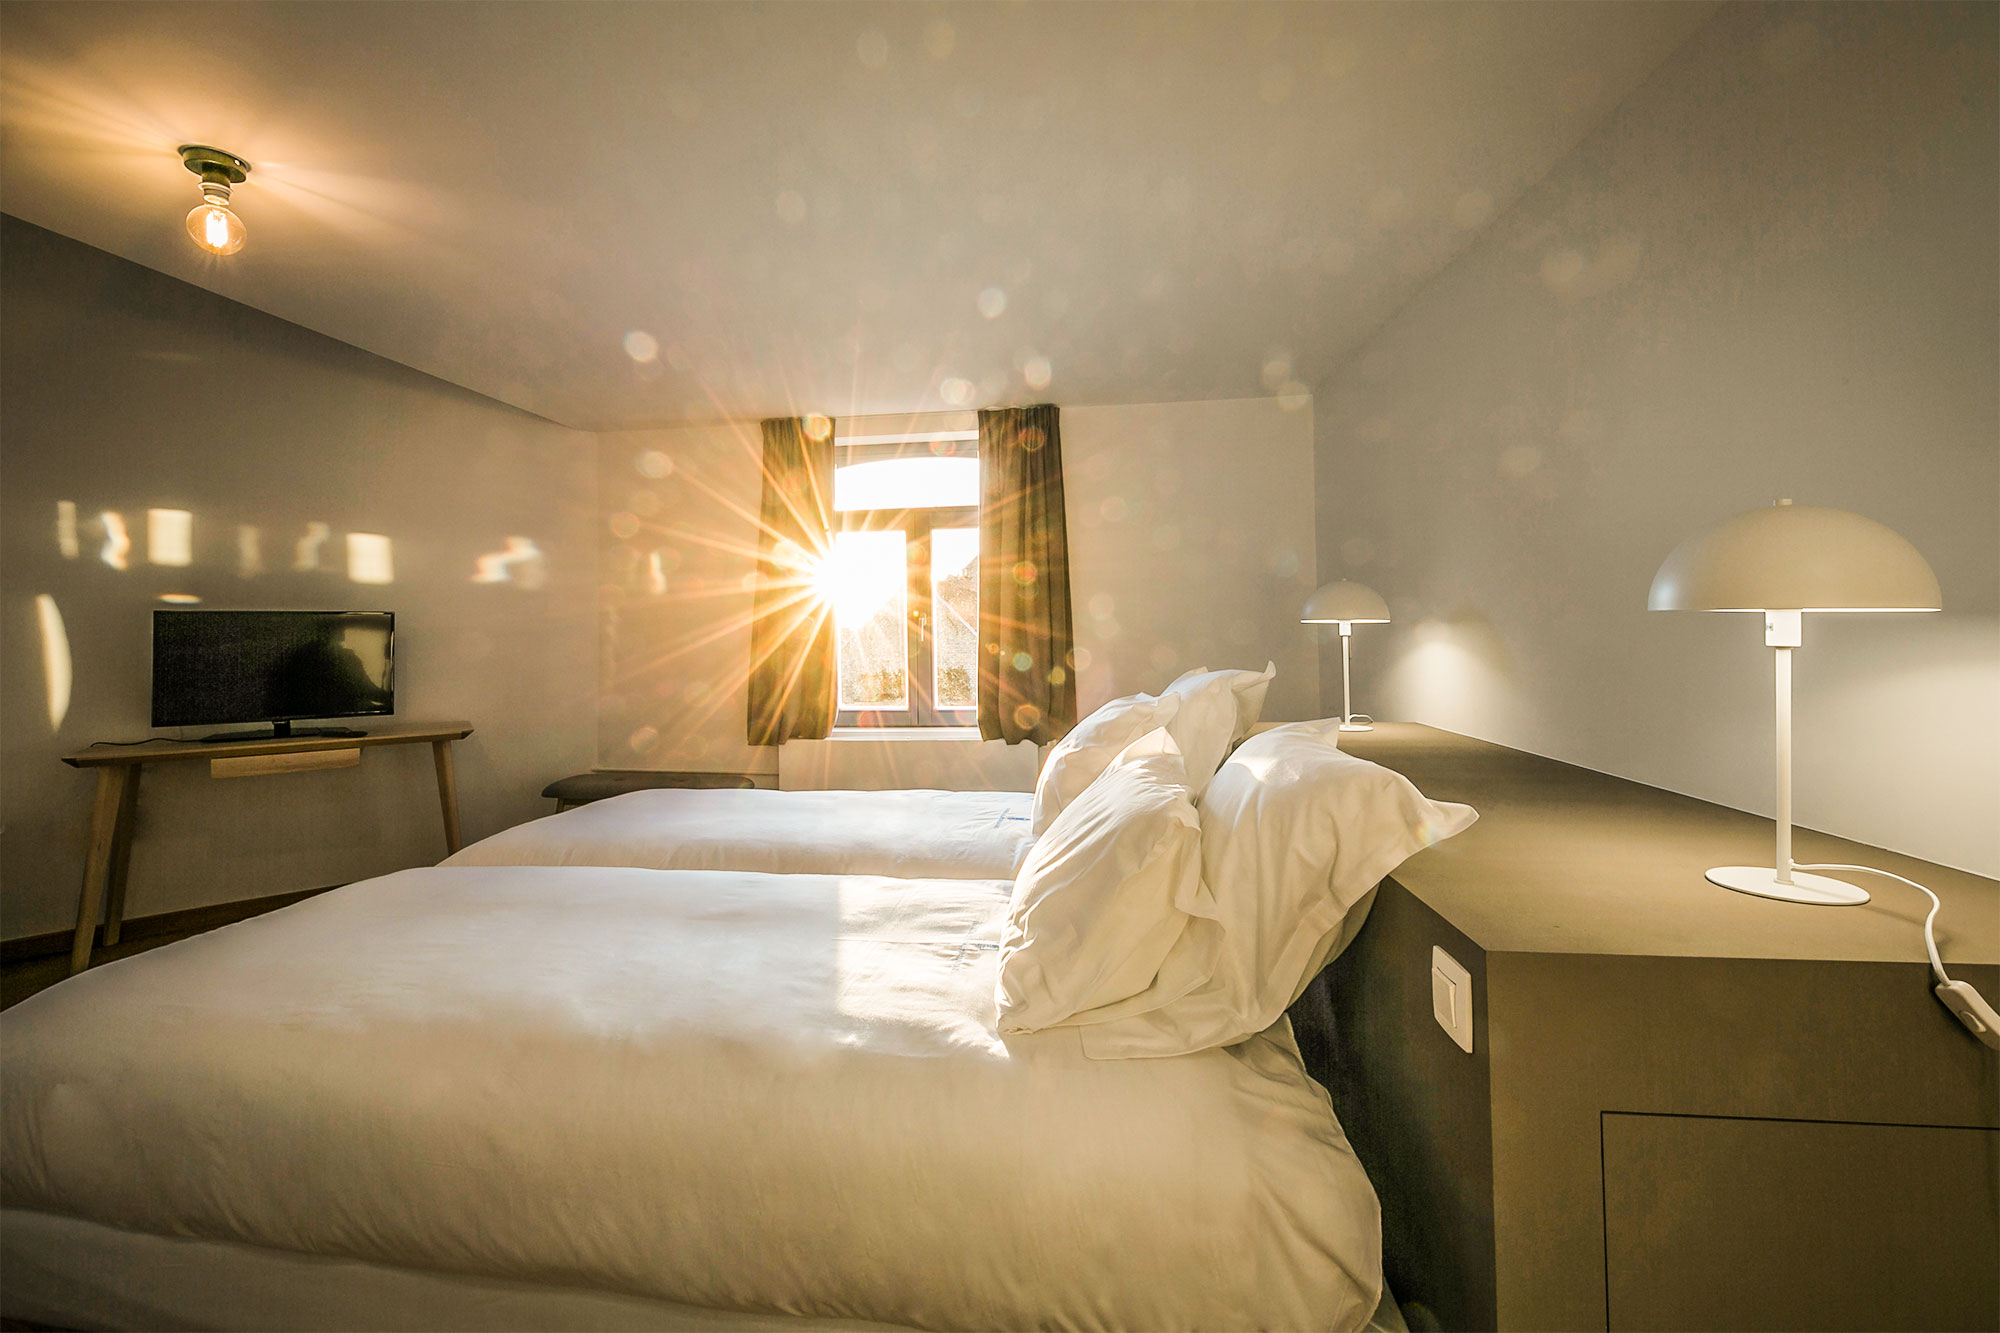 vakantiehuis te huur - moderne slaapkamer